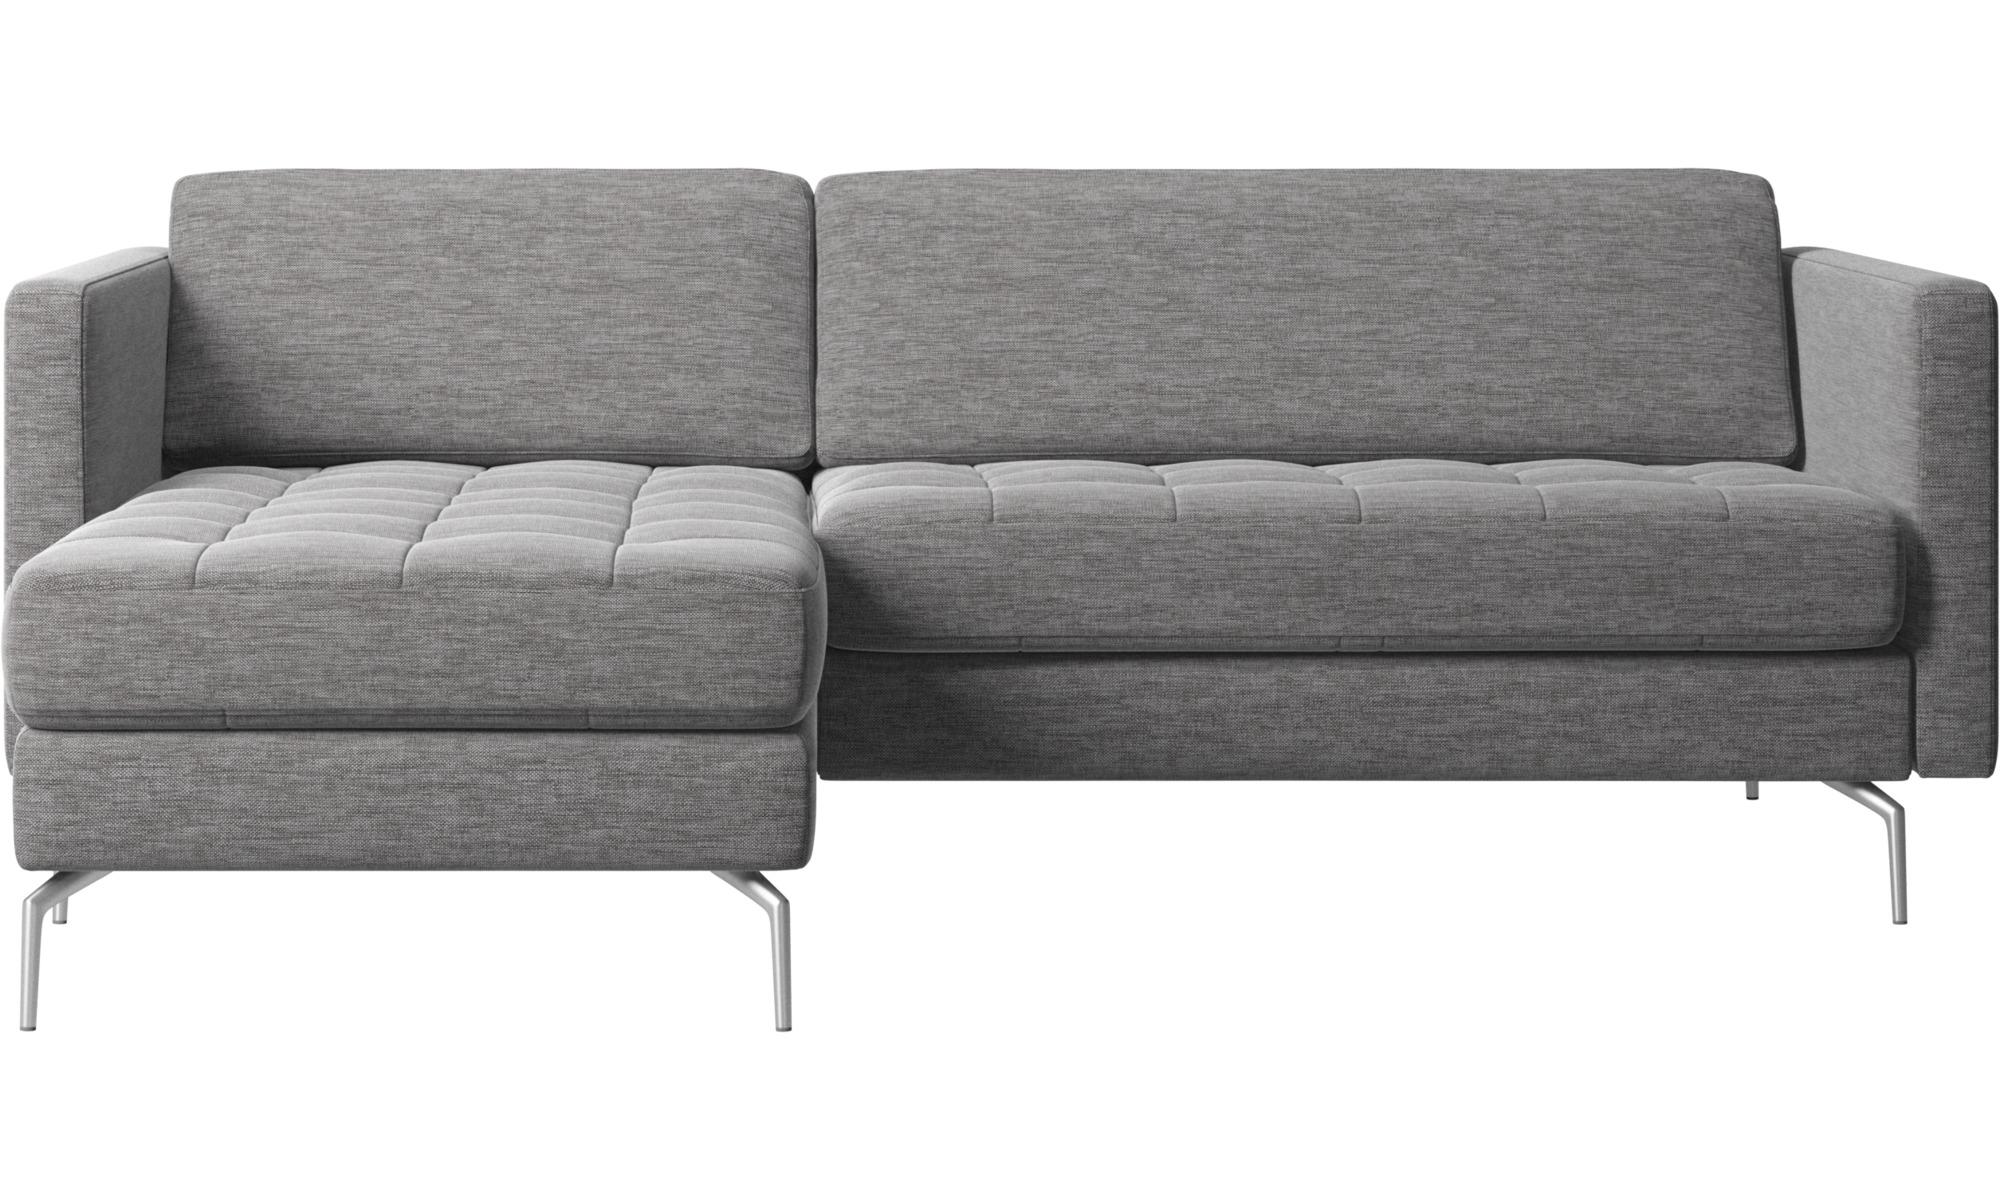 divaanisohvat osaka sohva sis lt lepomoduulin tuftattu istuin boconcept. Black Bedroom Furniture Sets. Home Design Ideas